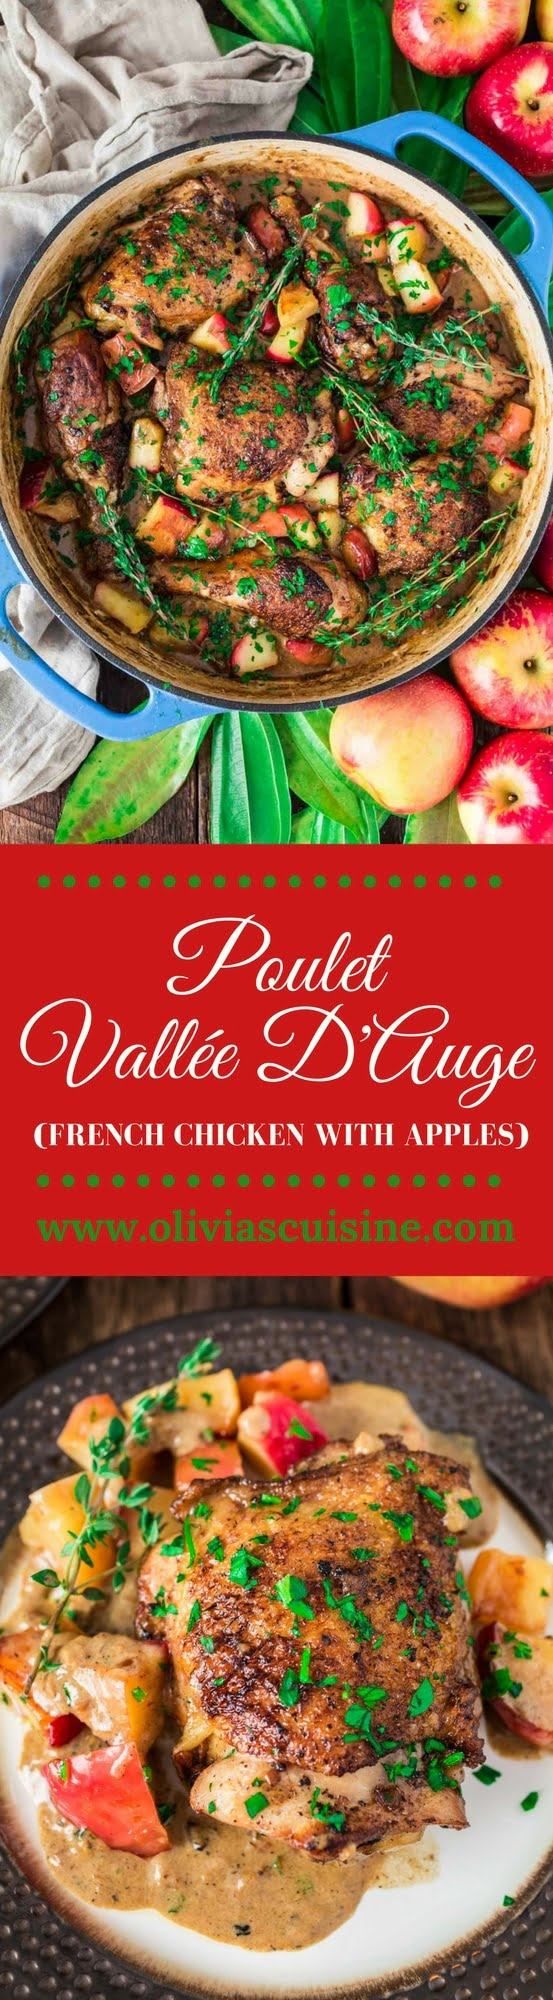 poulet-vallee-dauge-pinterest